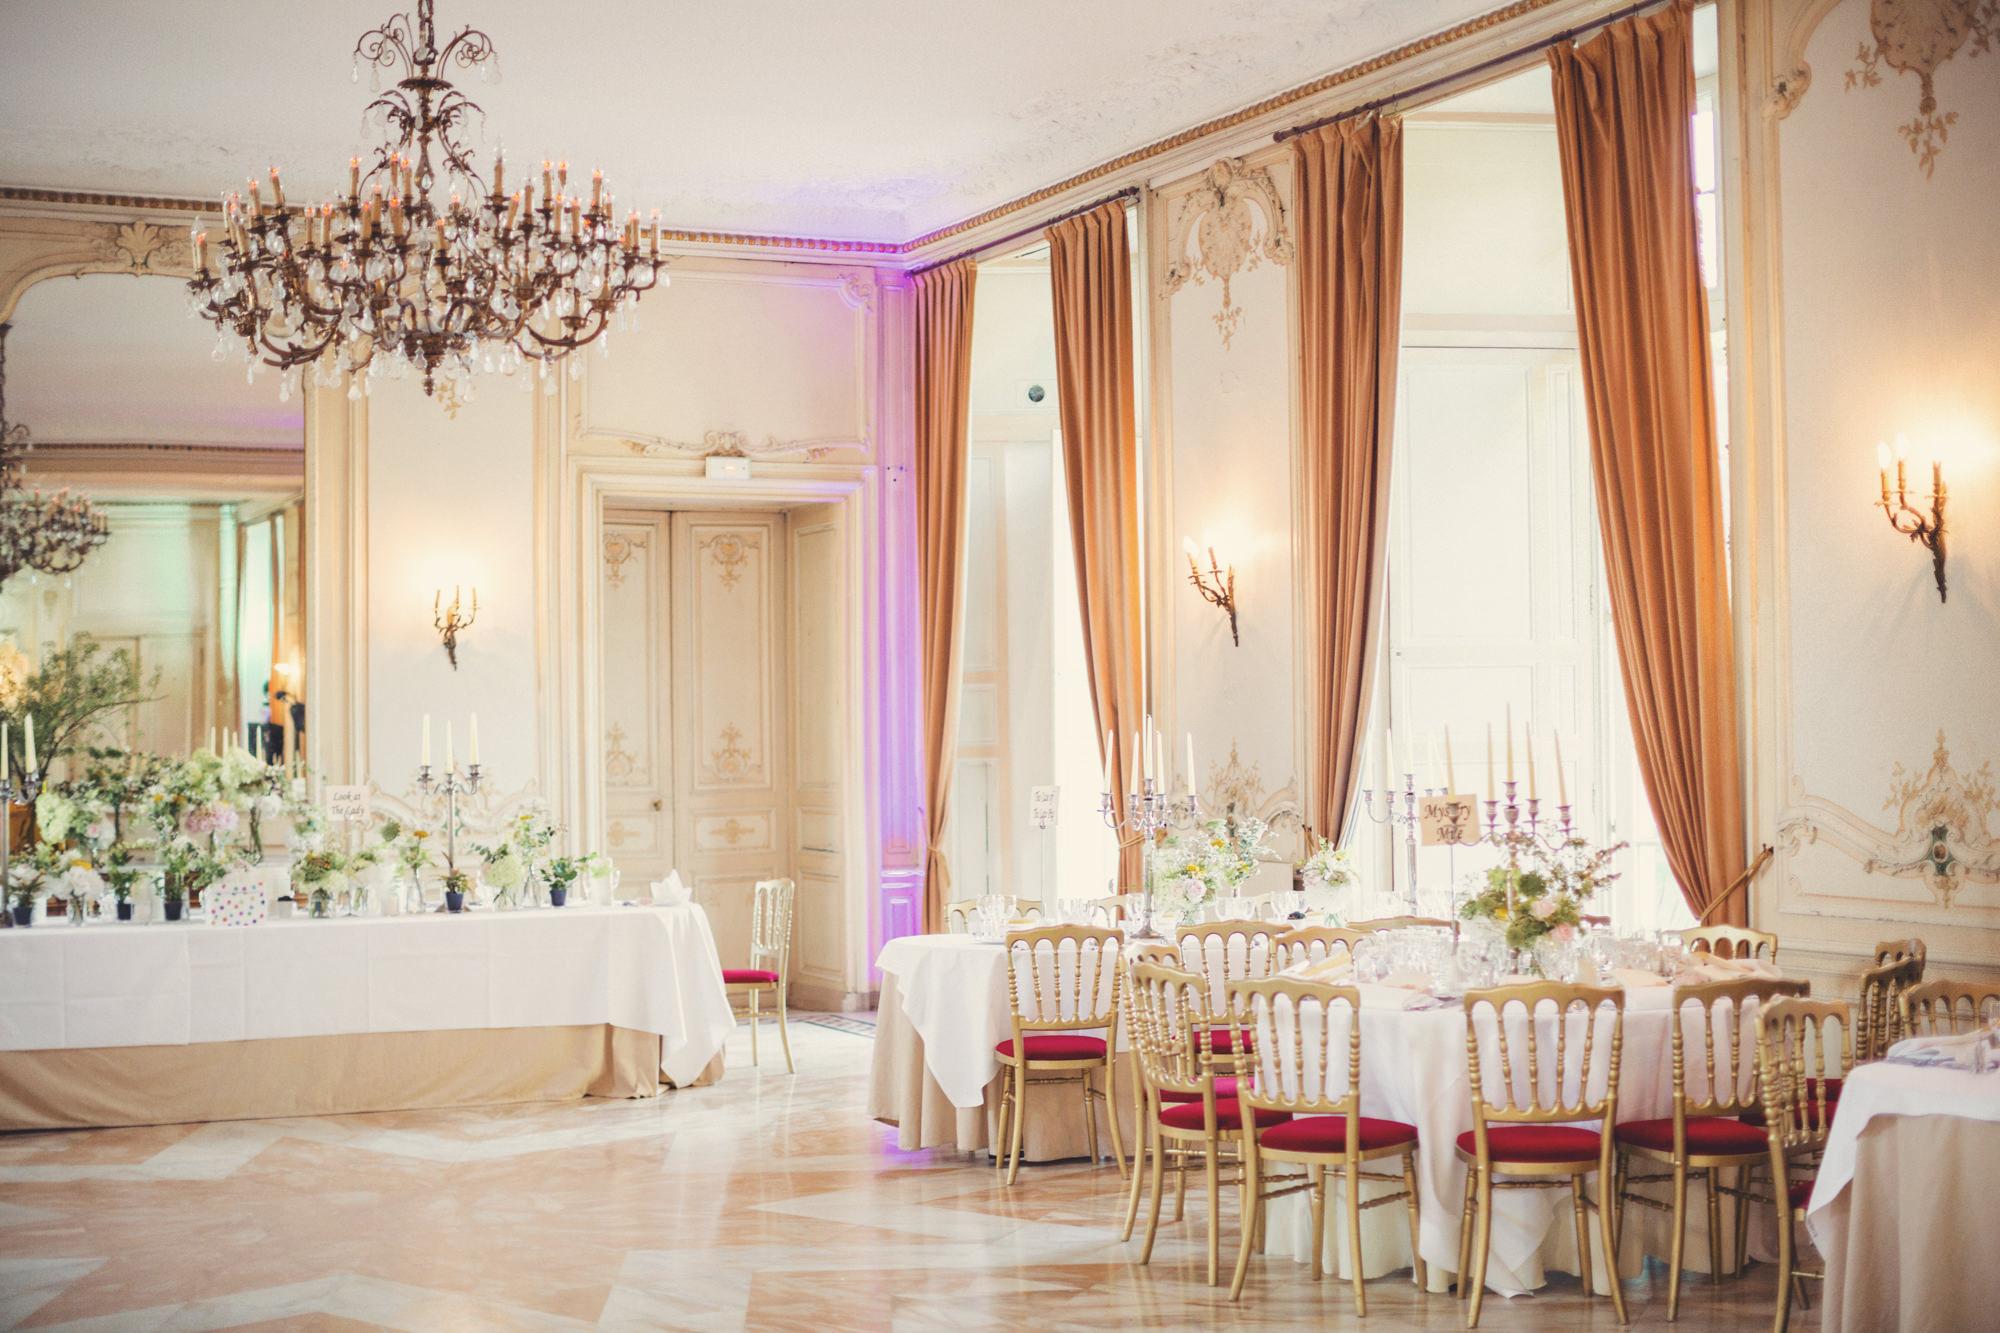 mariage au chateau dermenonvilleanne claire brun 94 - Chateau D Ermenonville Mariage